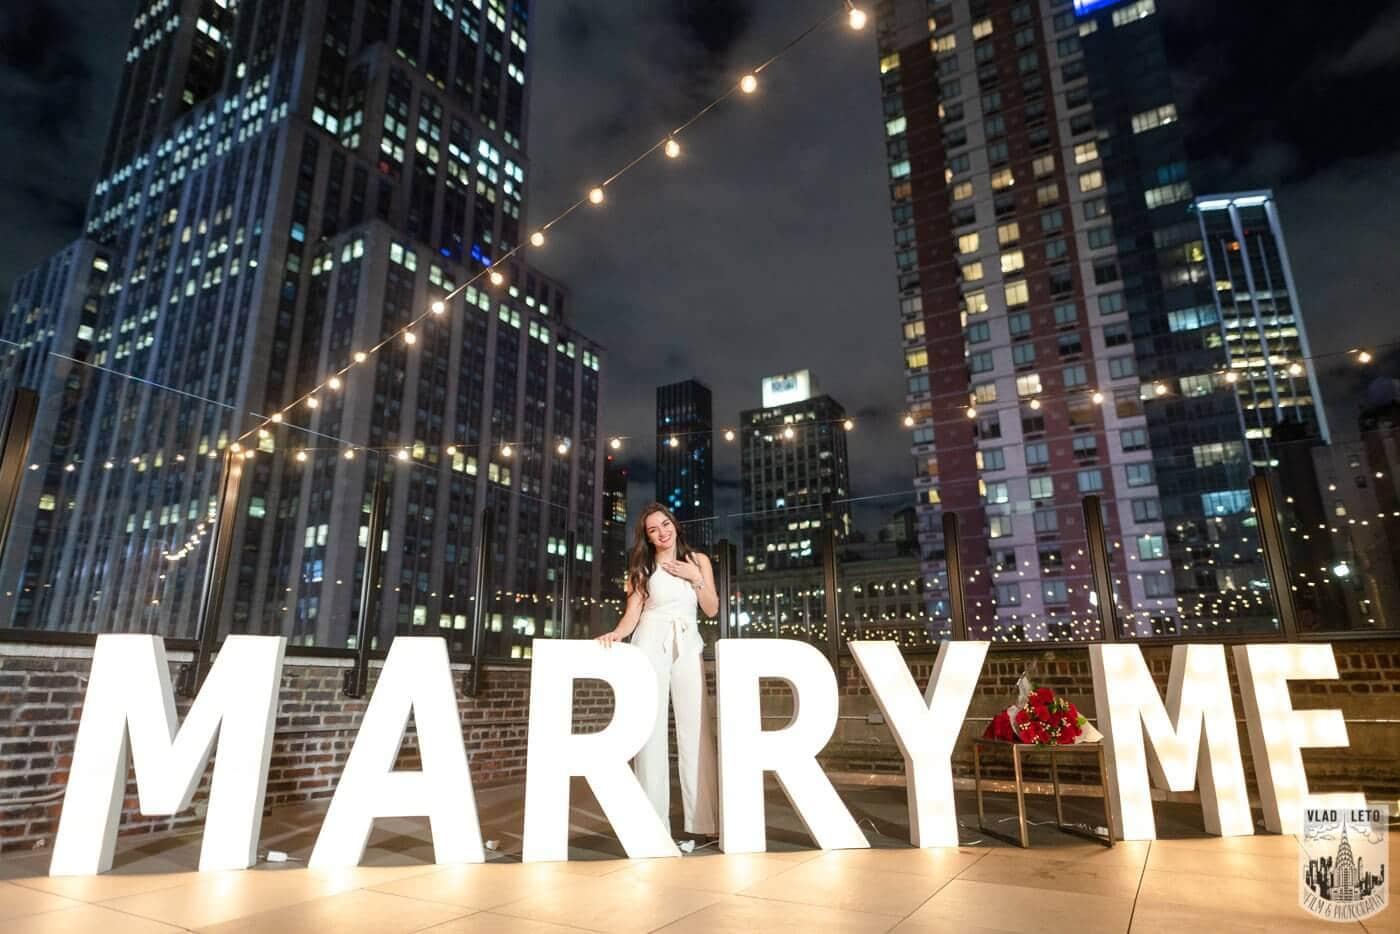 Photo 4 Gigantic Marry Me Letters Rooftop Proposal | VladLeto